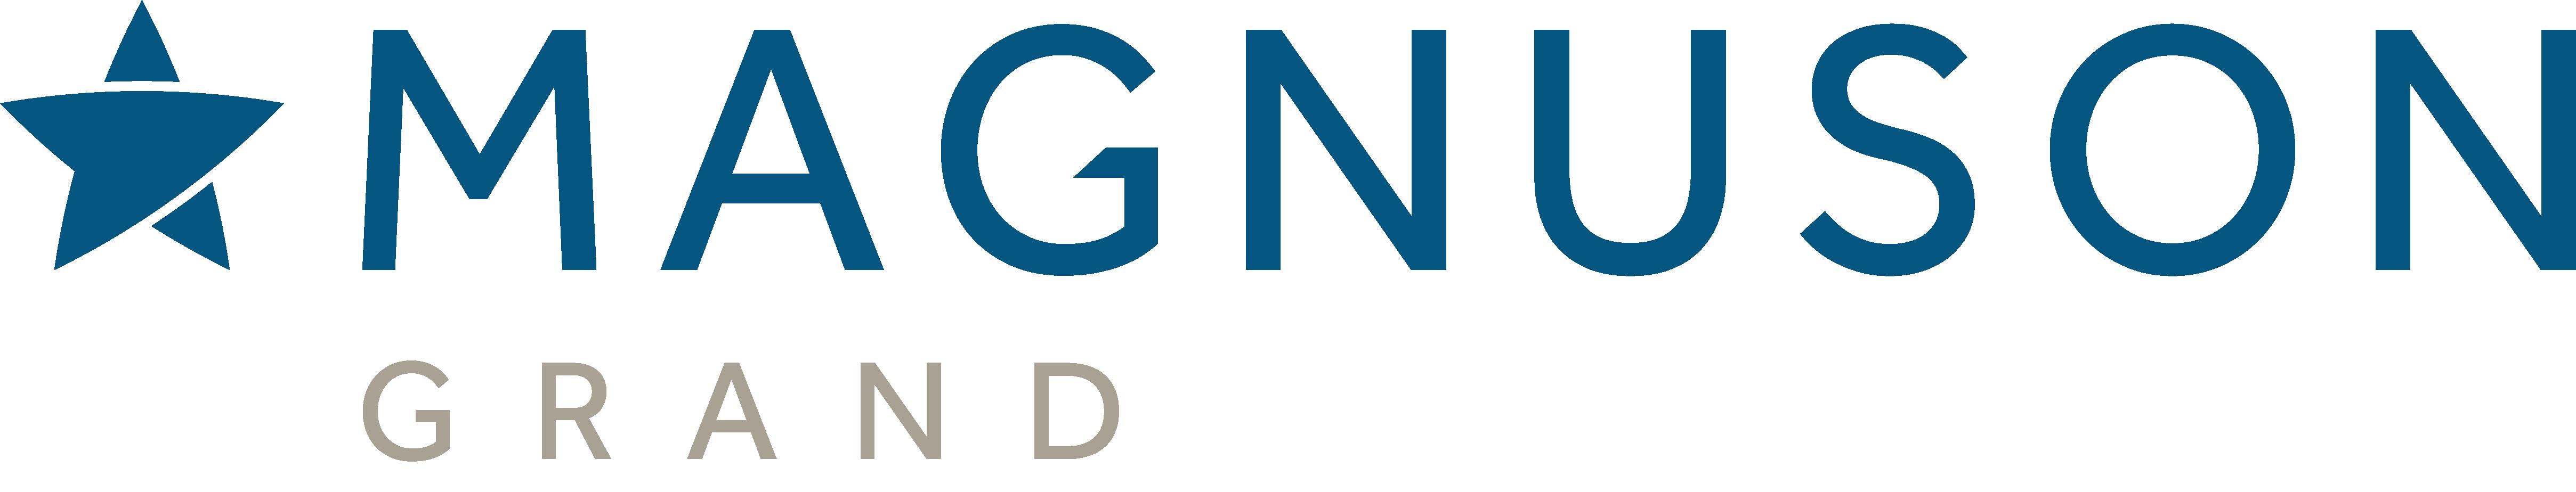 Magnuson Grand